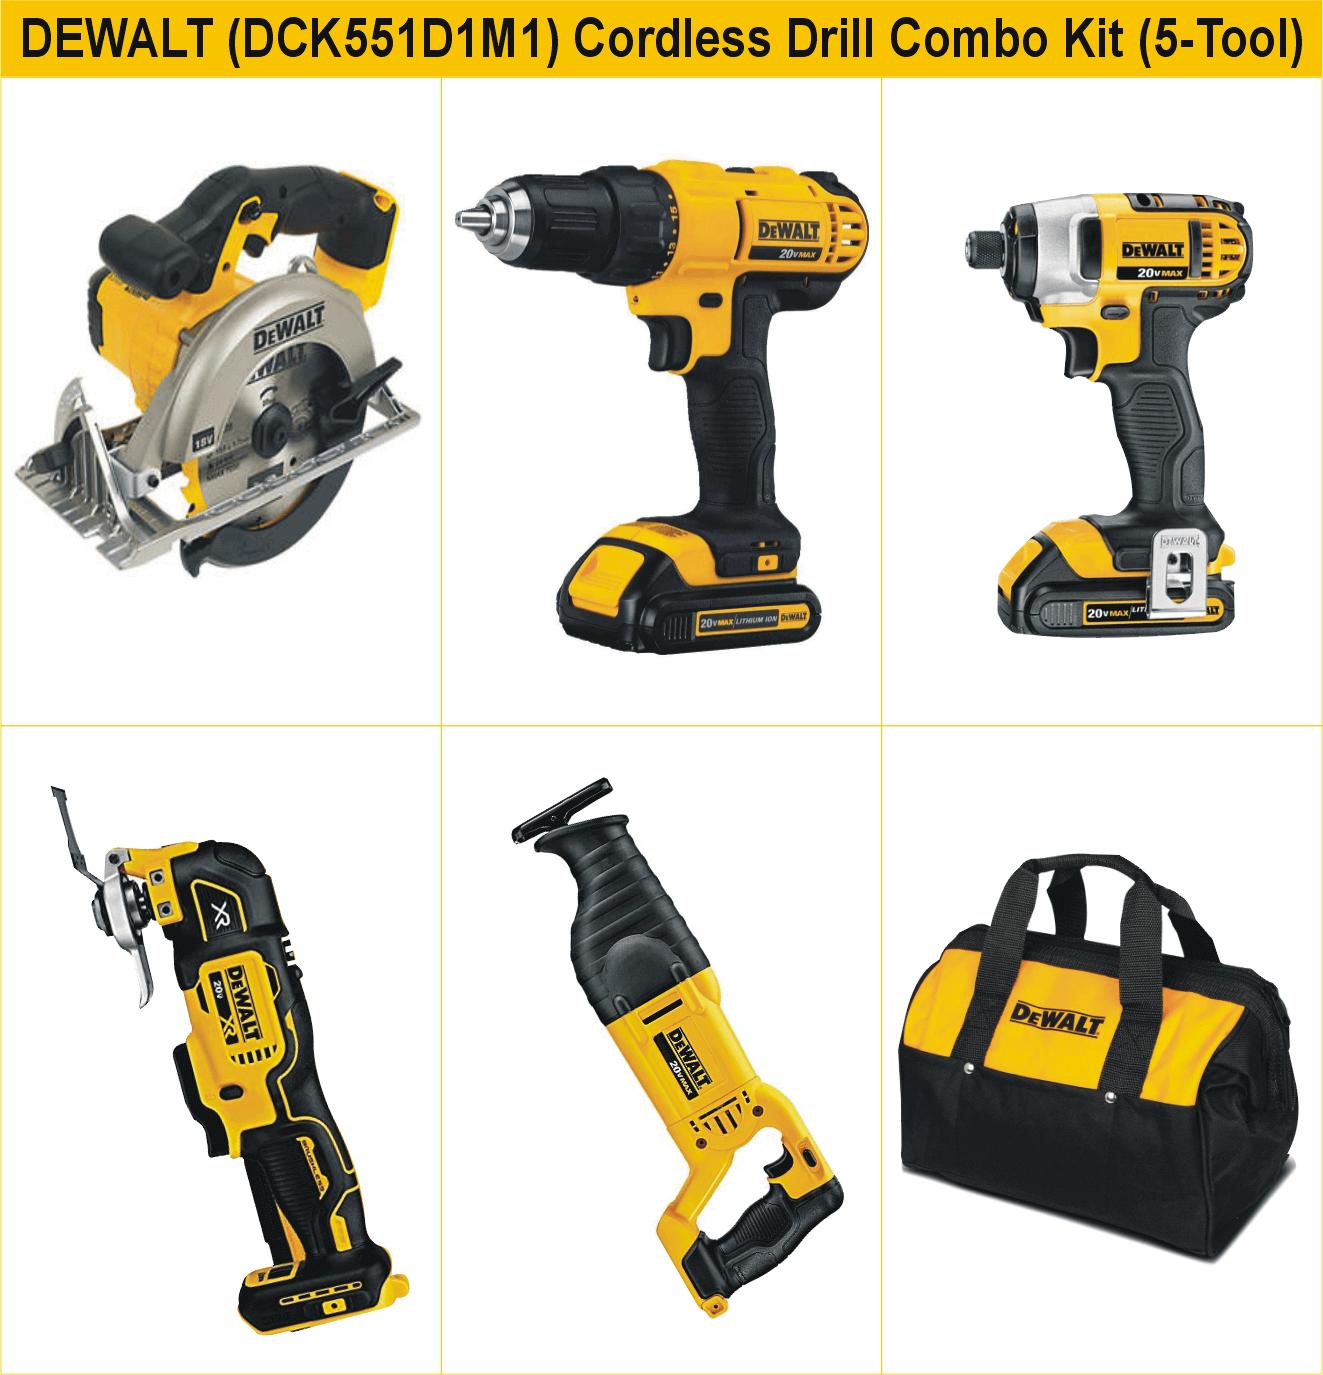 DEWALT (DCK551D1M1) 20V MAX Cordless Drill 5-Tool Combo Kit